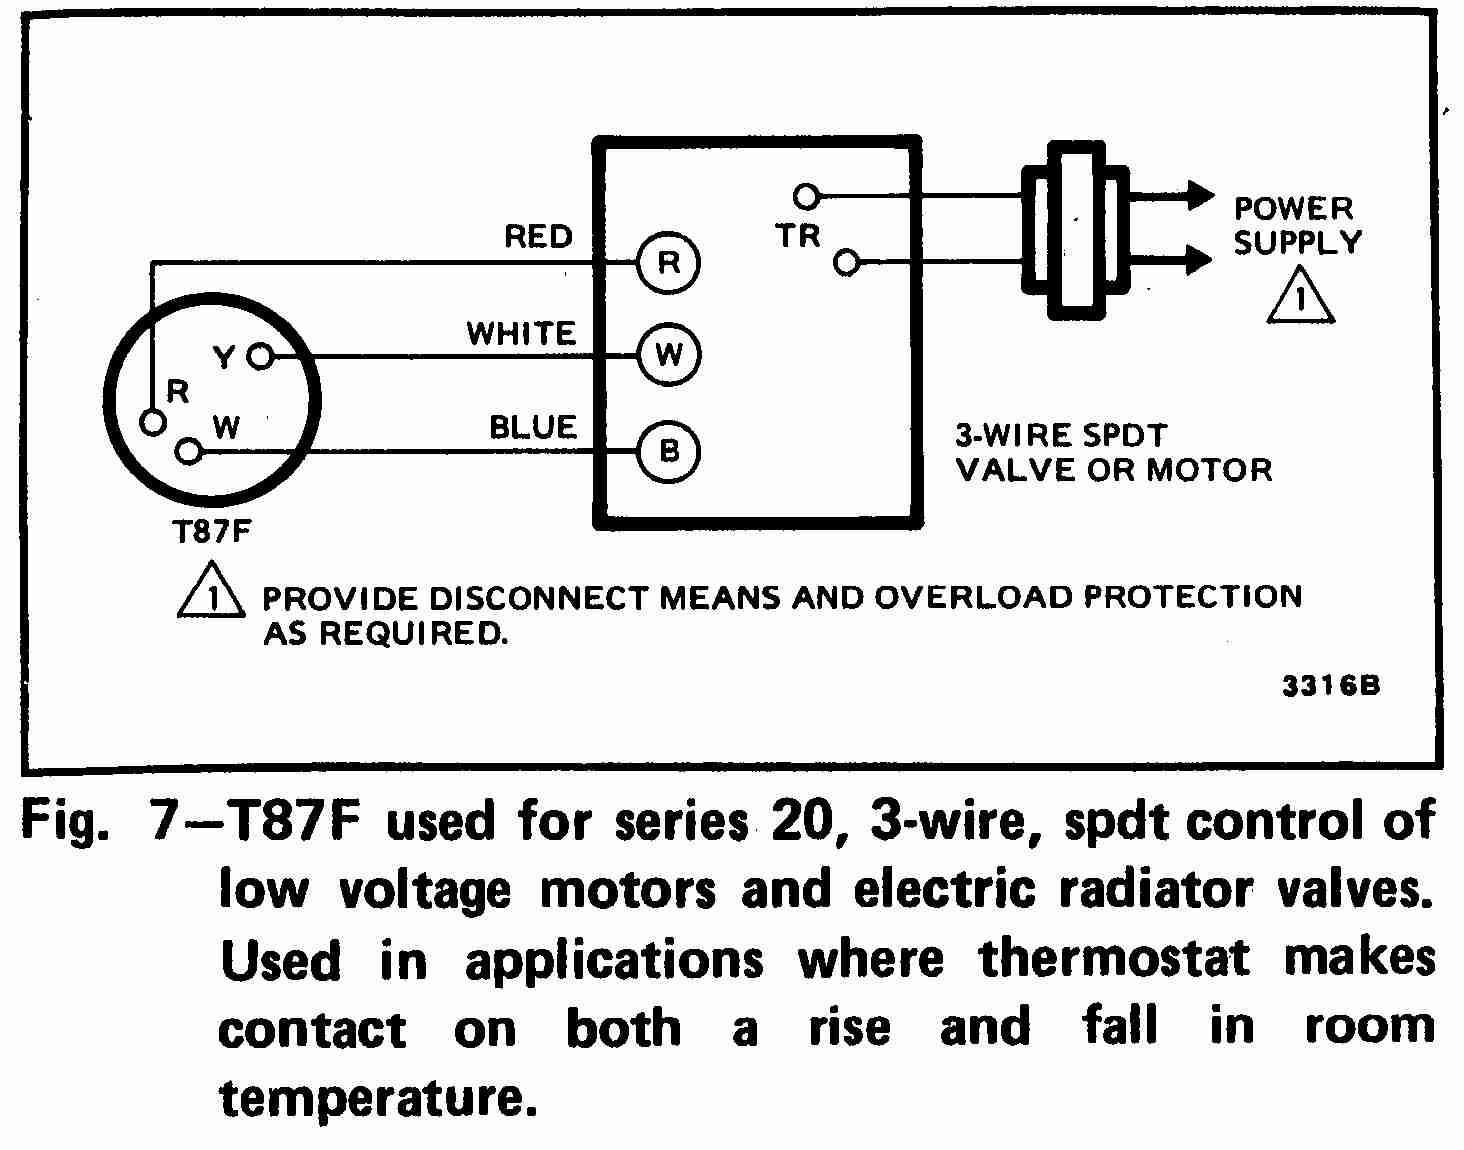 Chromalox Heater Wiring Diagram Perfect Honeywell Thermostat Wiring S 68 For Chromalox Heater Arresting